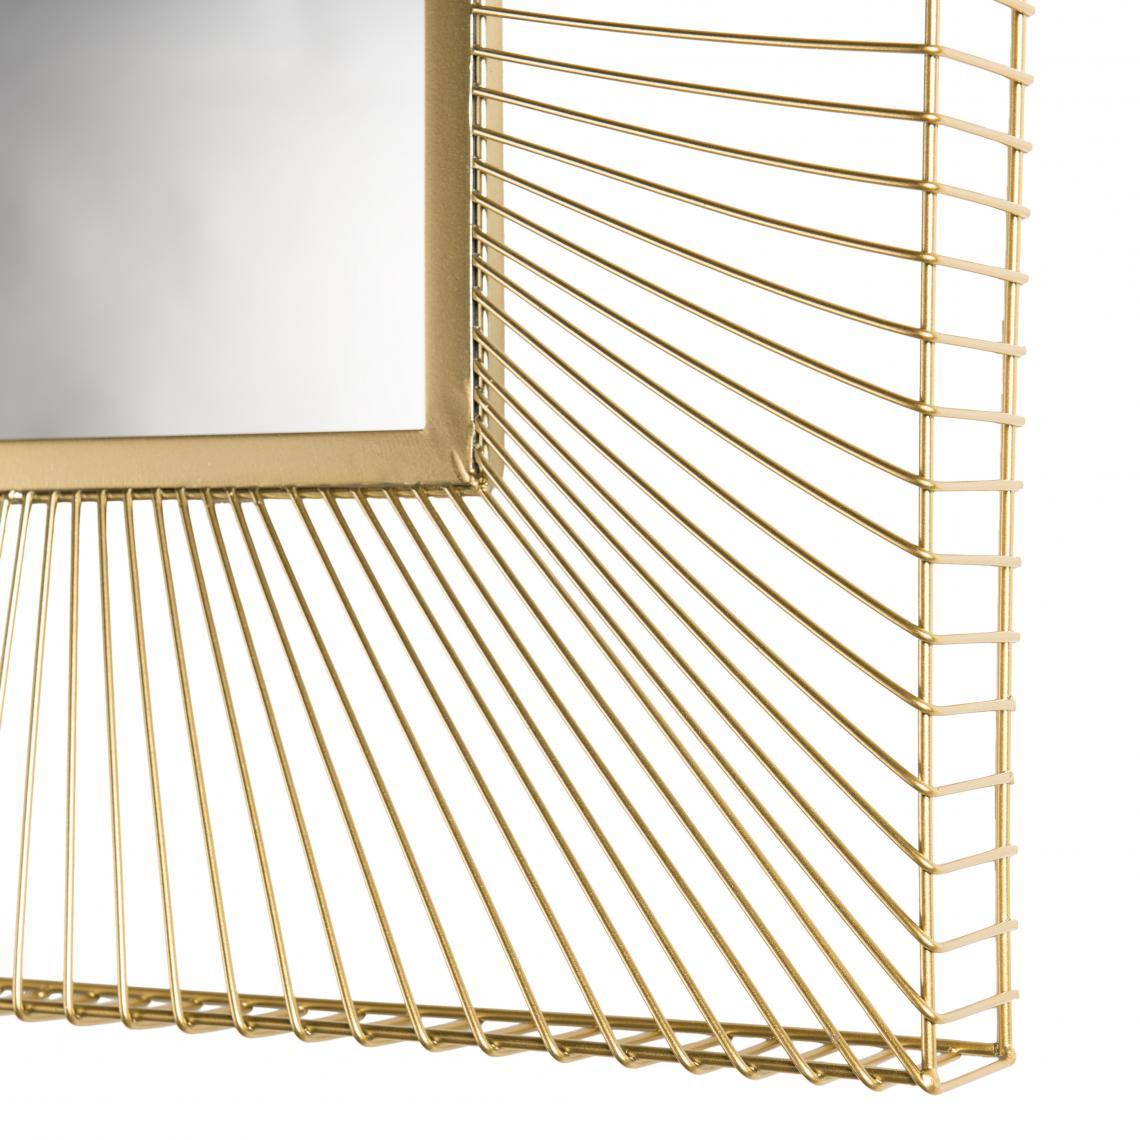 Miroir carré métal doré - TALIA mIMgl